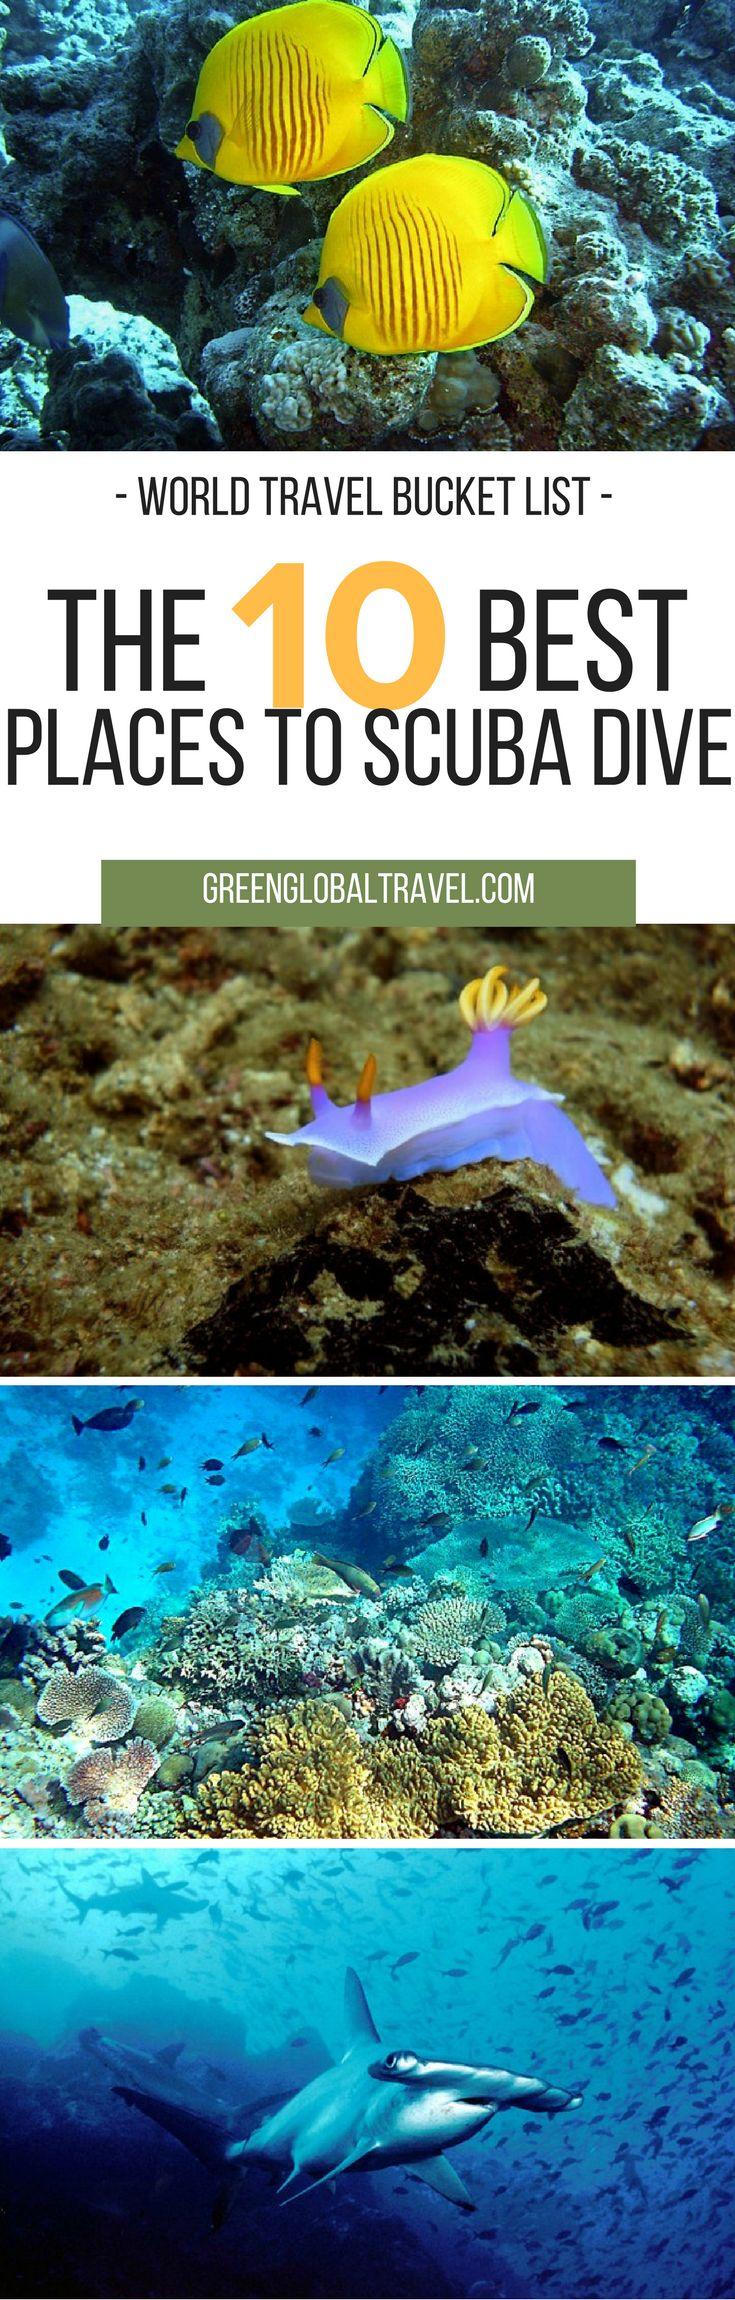 Here are the ten best spots to go scuba diving! | Sipadan, Borneo | Cocos Island, Costa Rica | Red Sea of Dahab, Egypt | Great Barrier Reef, Australia | Kona Mantas, Hawaii | Bay Islands, Honduras | Darwin's Arch, Galapagos Islands | Kimbe Bay, Papua New Guinea | Anilao, Philippines | Chuuk, Micronesia |